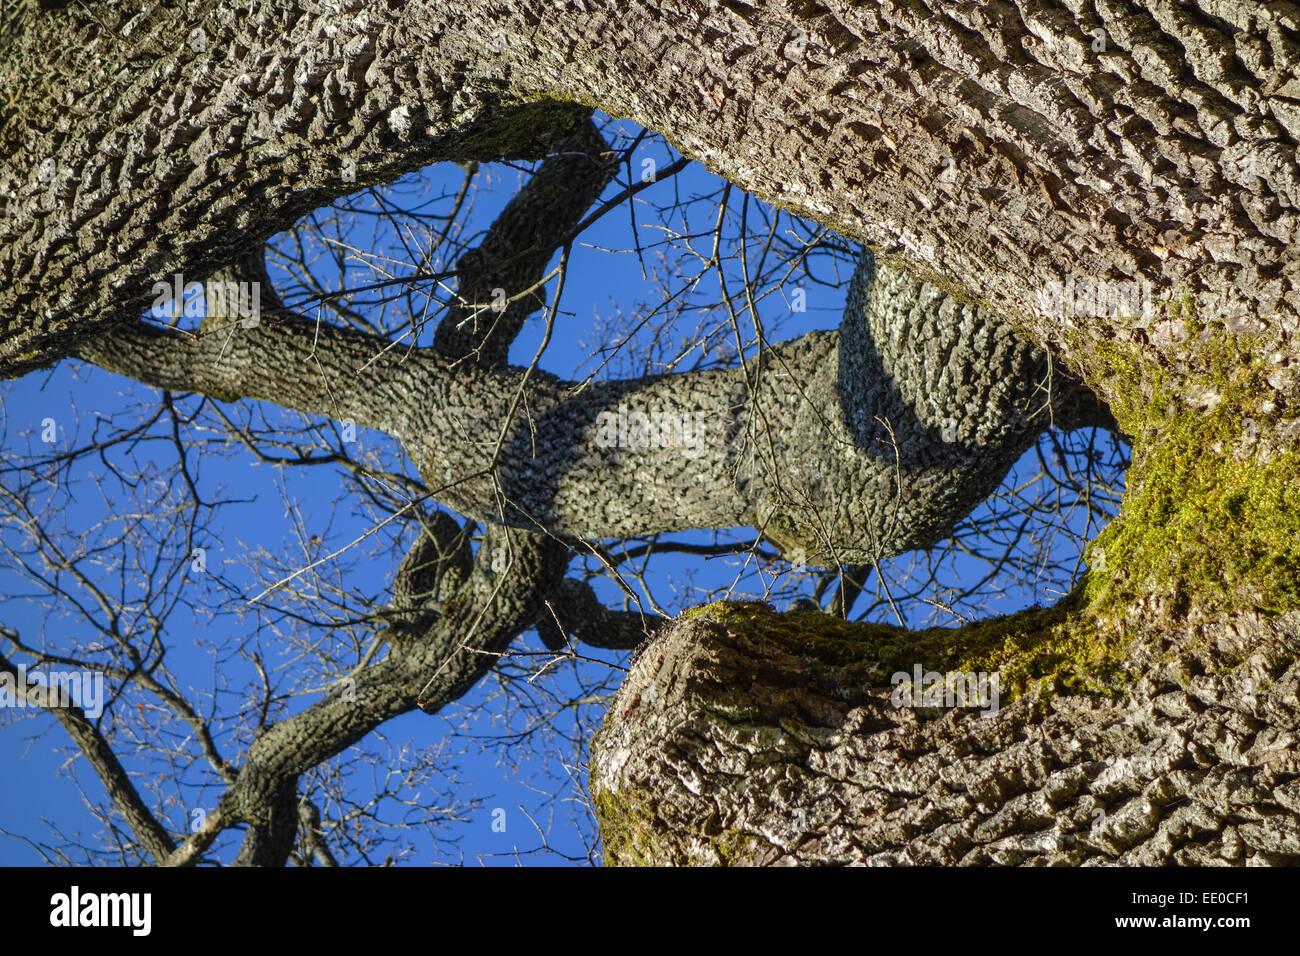 Baum, Eiche im Winter ohne Blätter, Tree, oak tree in winter devoid of leaves, English Oak, Quercus Robur, Bark, Stock Photo